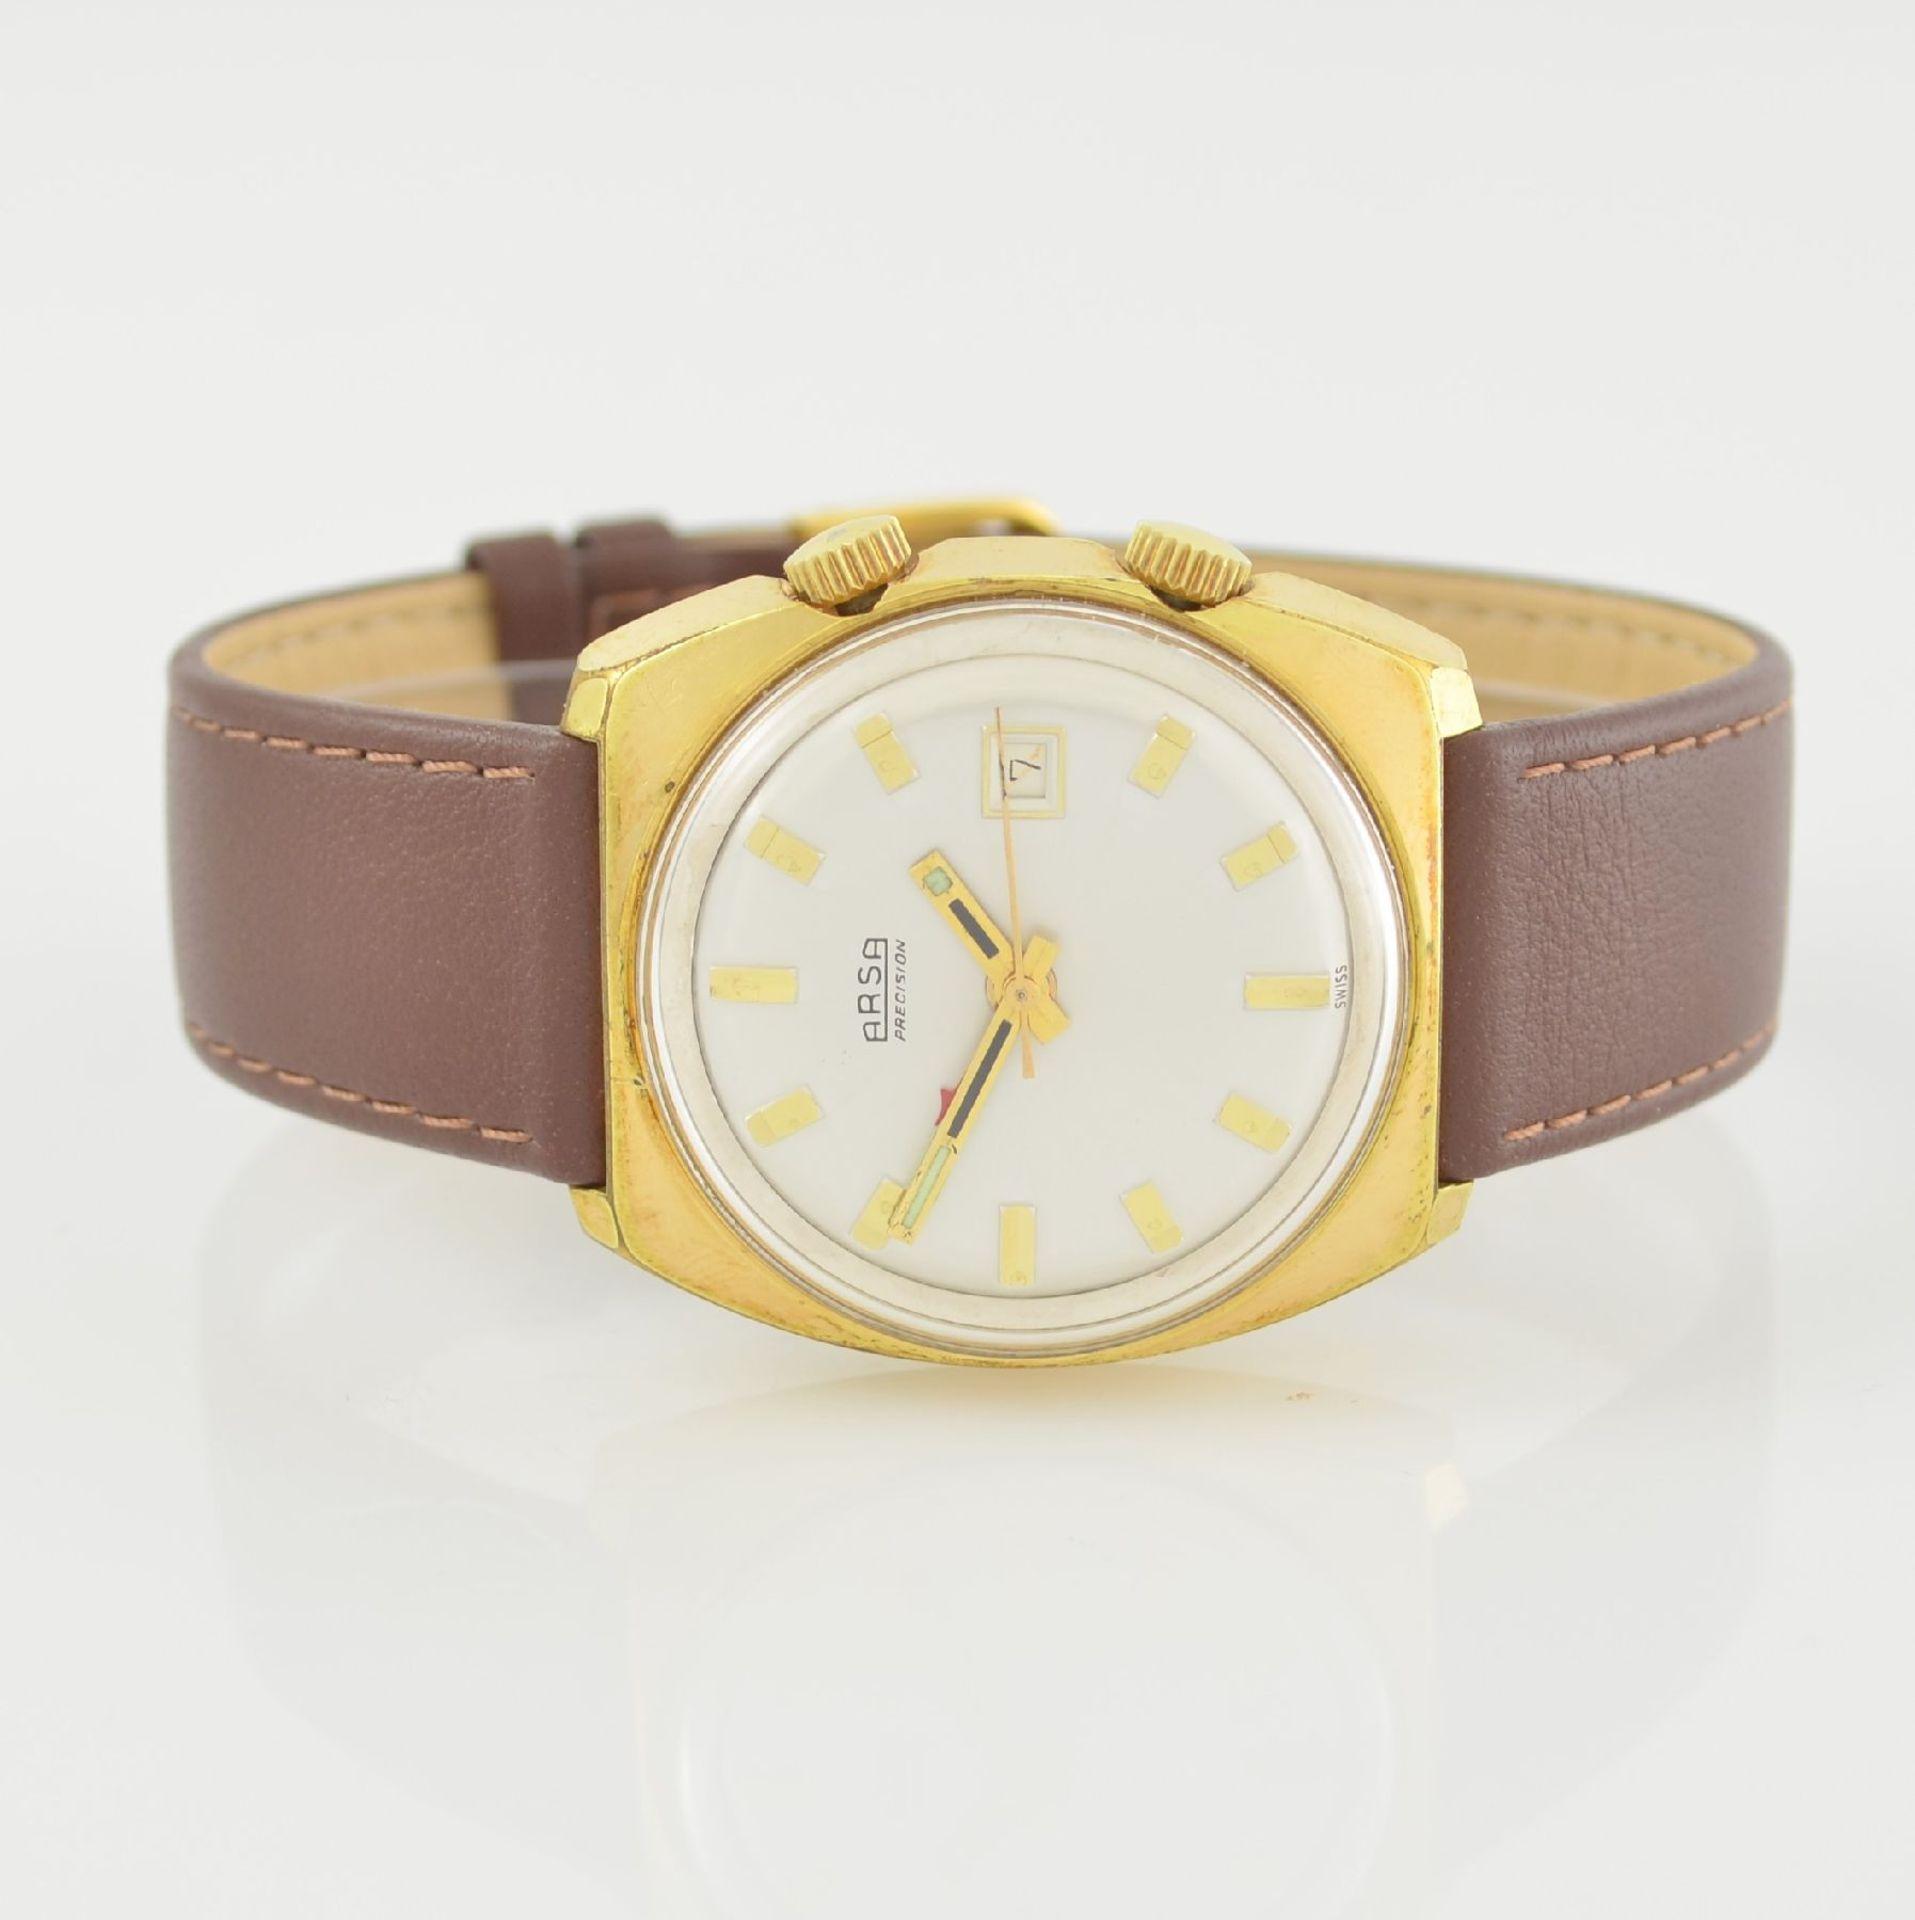 Konvolut: 2 Armbanduhren, beide Schweiz um 1970, beide Metall verg., 1 x Arsa Armbandwecker, Boden